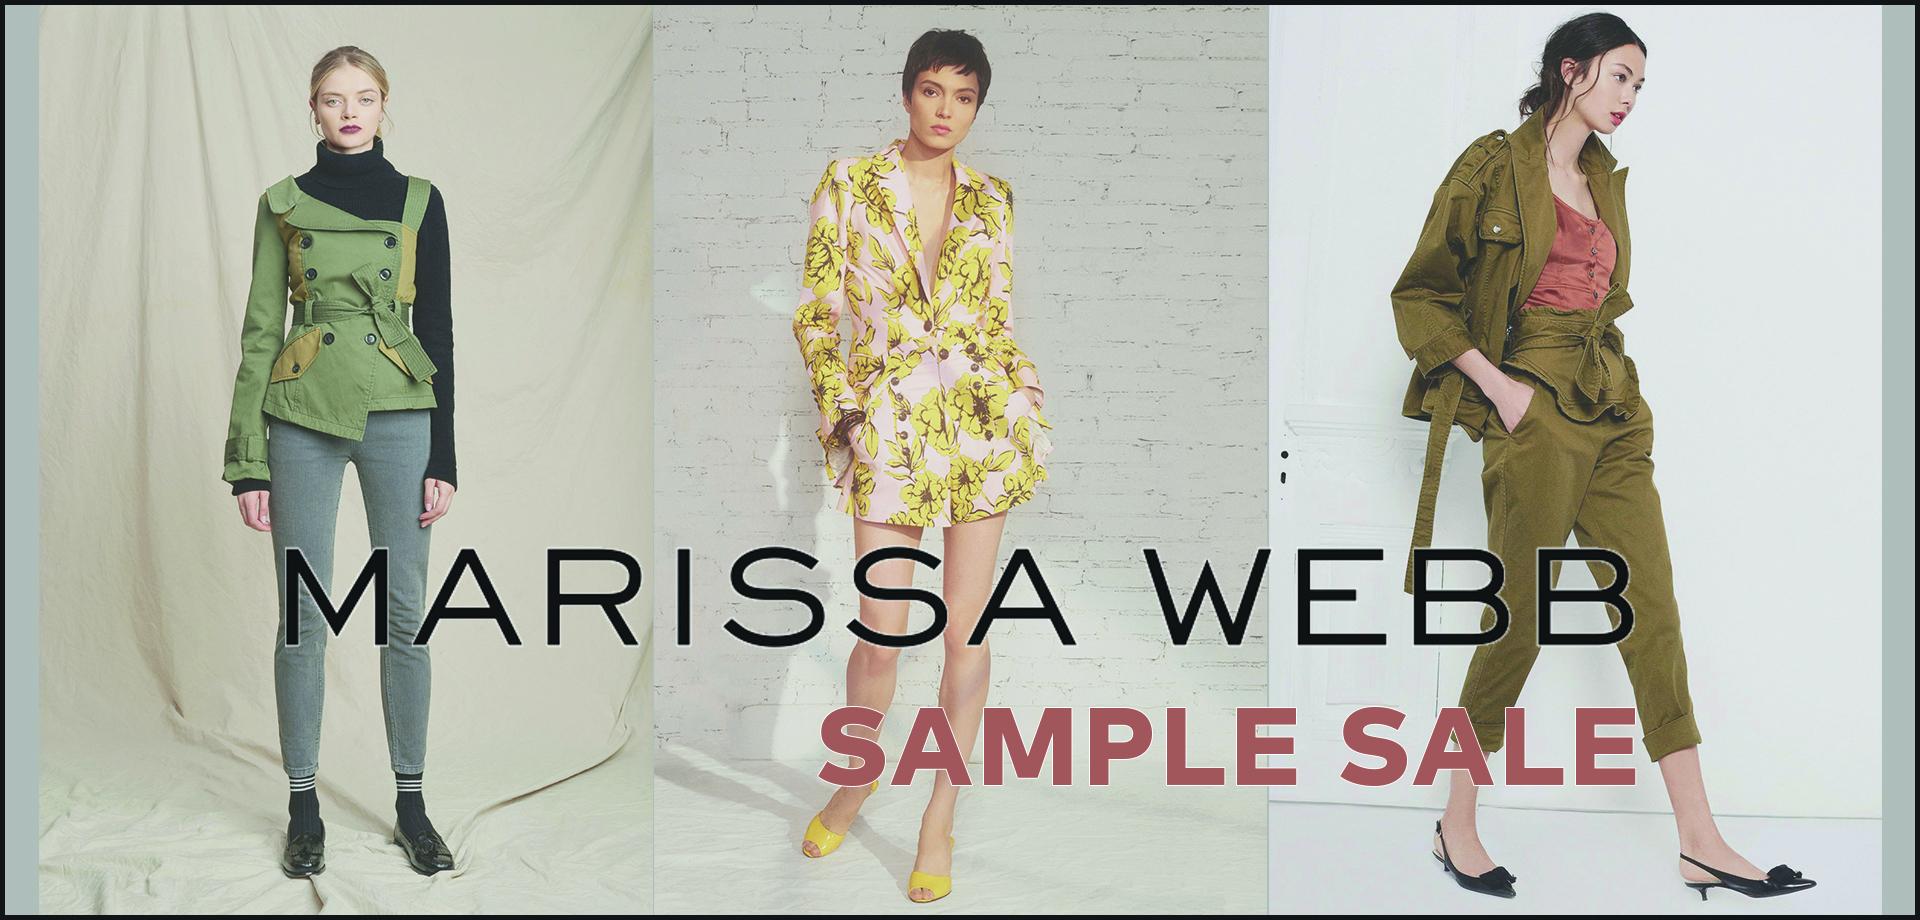 BANNER_Marissa_Web-Sample-Sale_260NY_April19.jpg